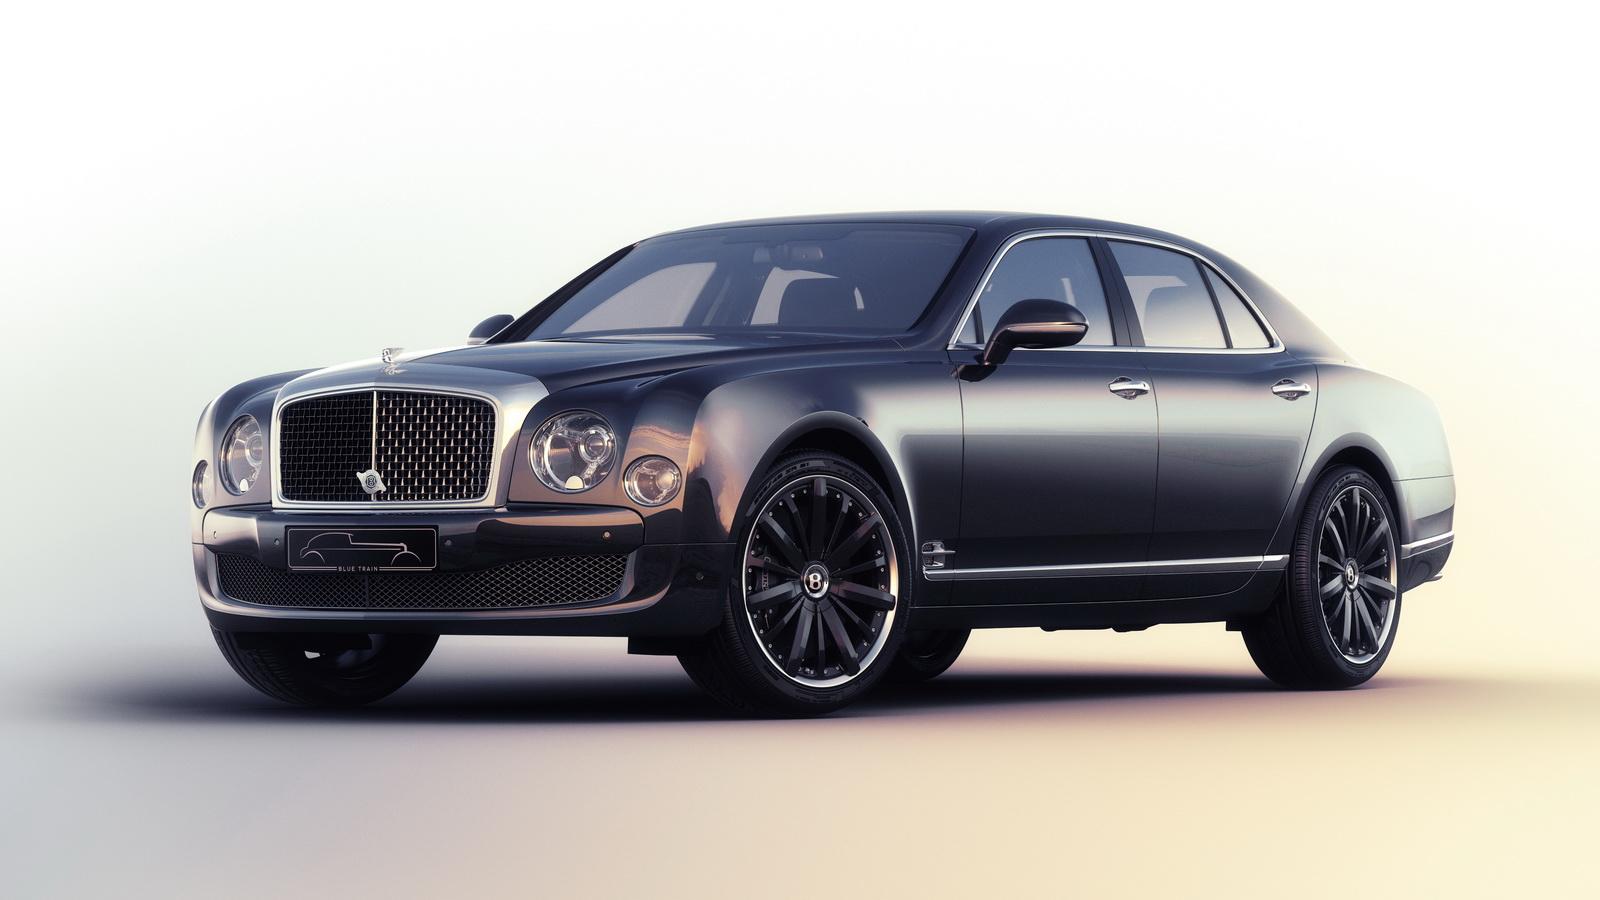 Aj95 Bentley Blue Drive Car: Bentley Reveals Mulsanne Speed 'Blue Train' Limited